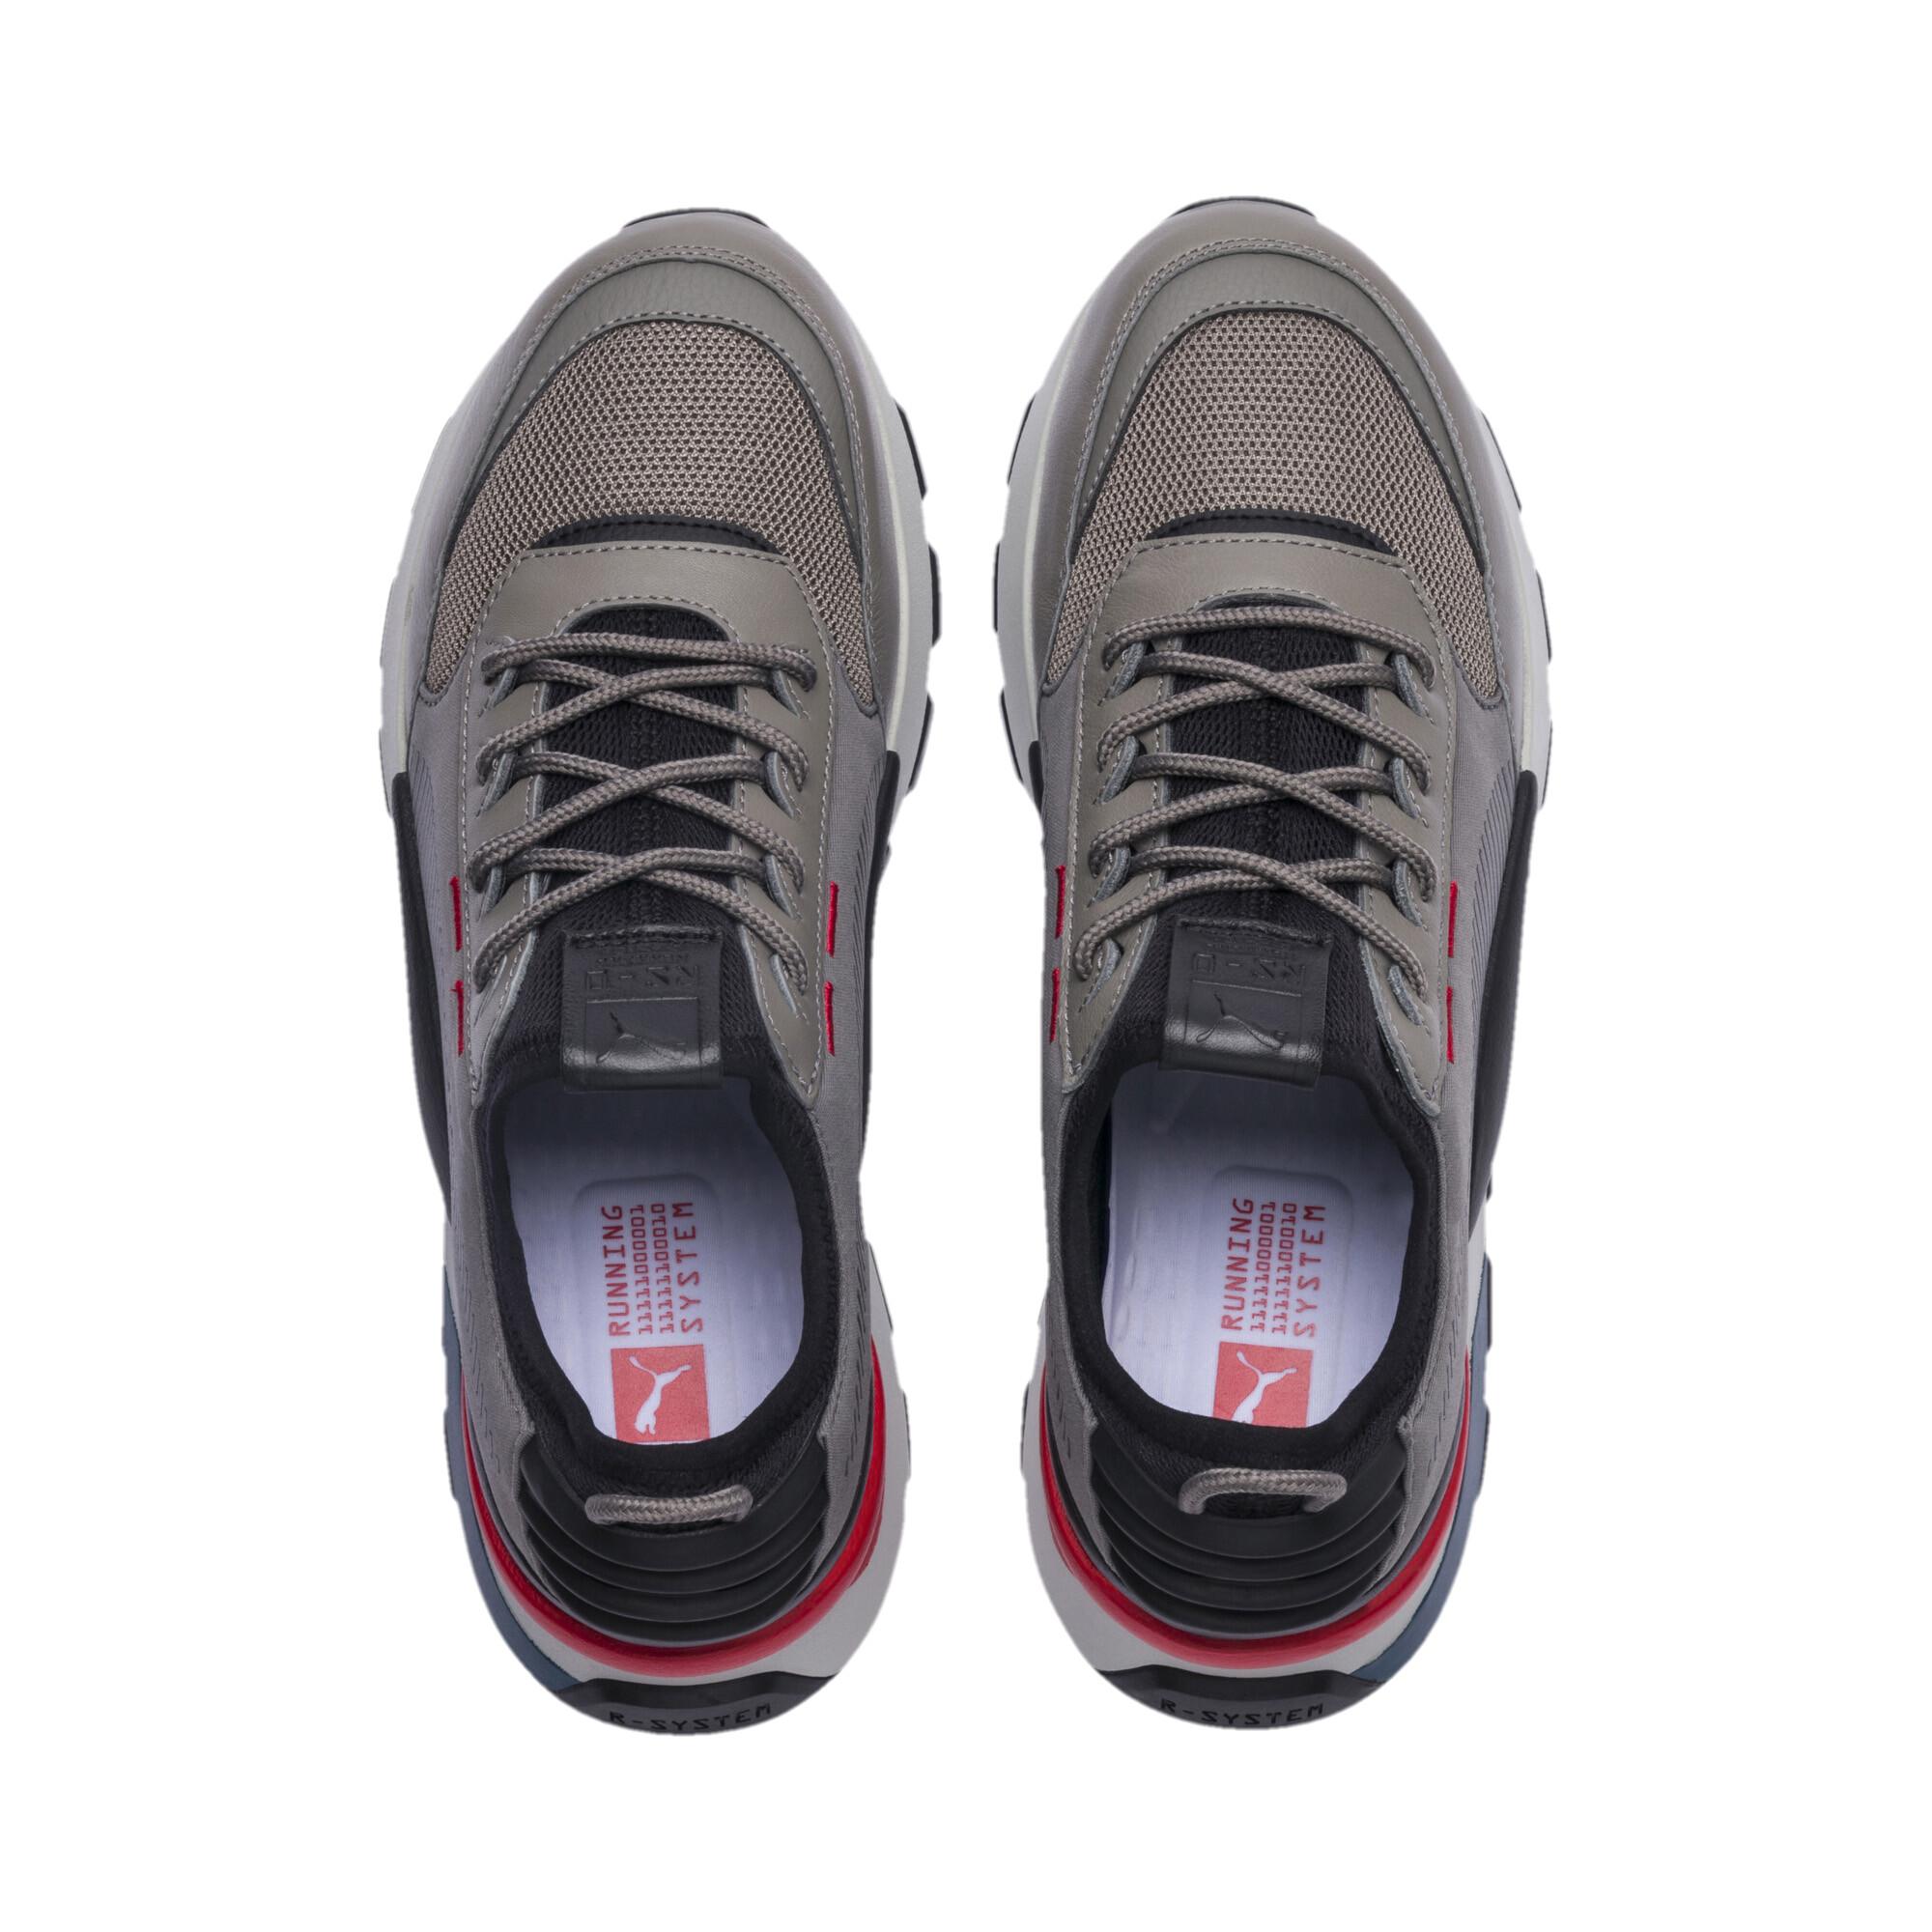 PUMA-RS-0-Tracks-Unisex-Shoe-Evolution thumbnail 21